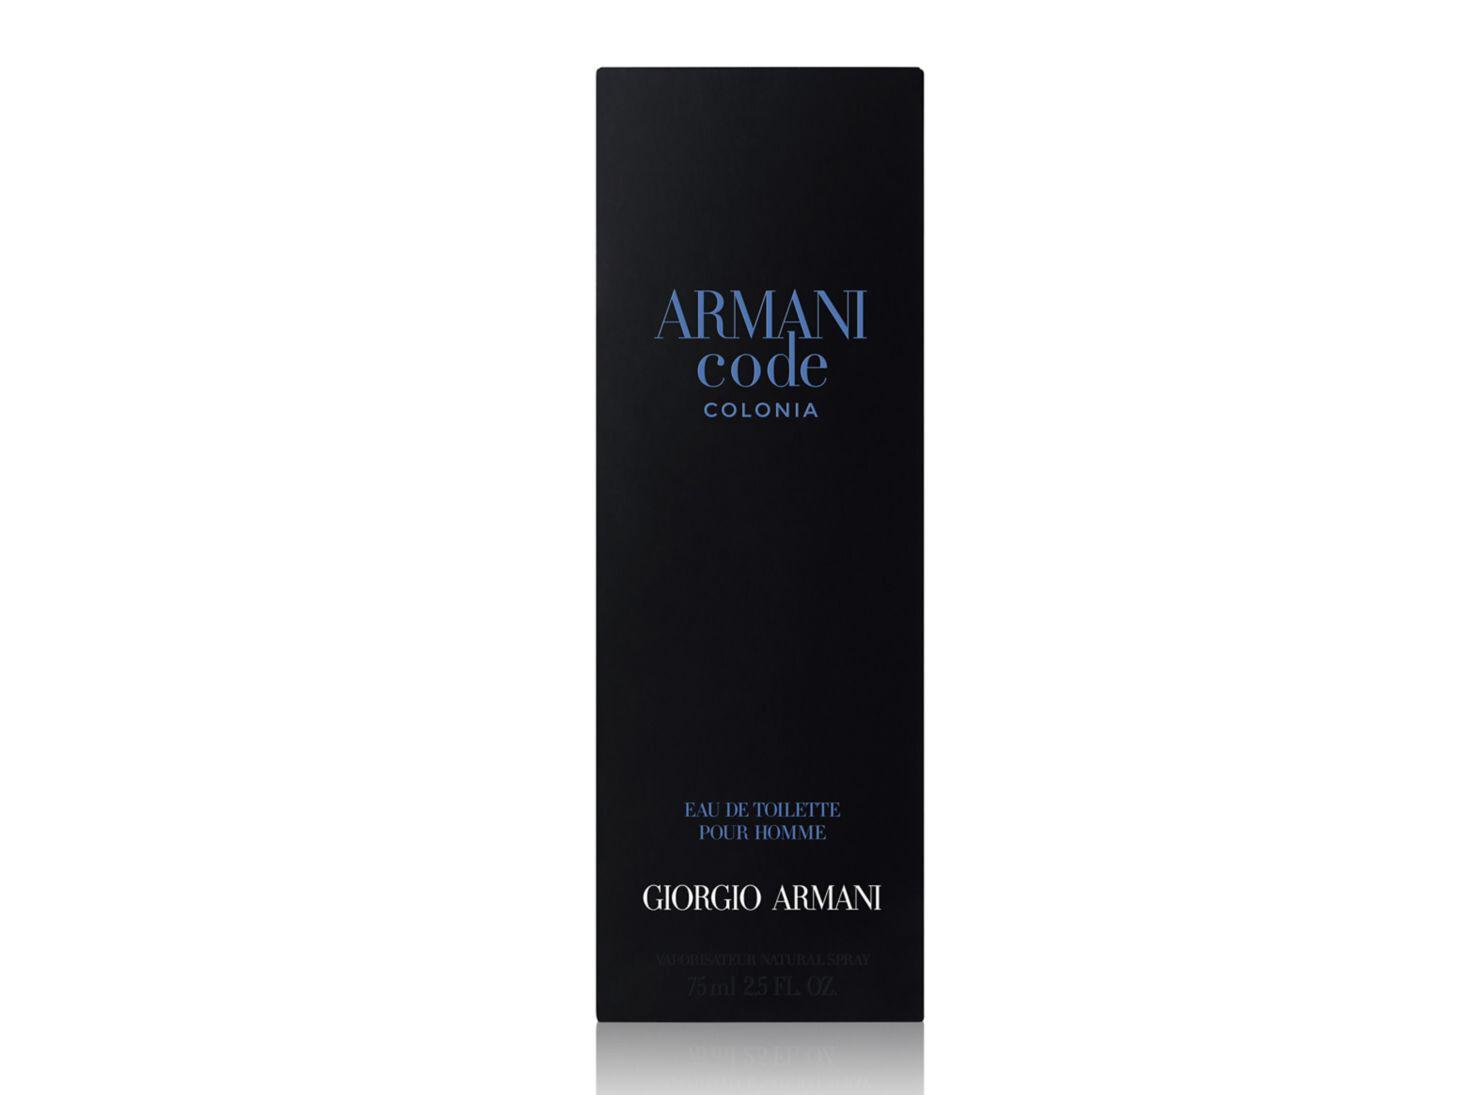 Armani Giorgio Colonia Code Perfumes Ml 75 En Perfume Hombre htQrBCsdxo